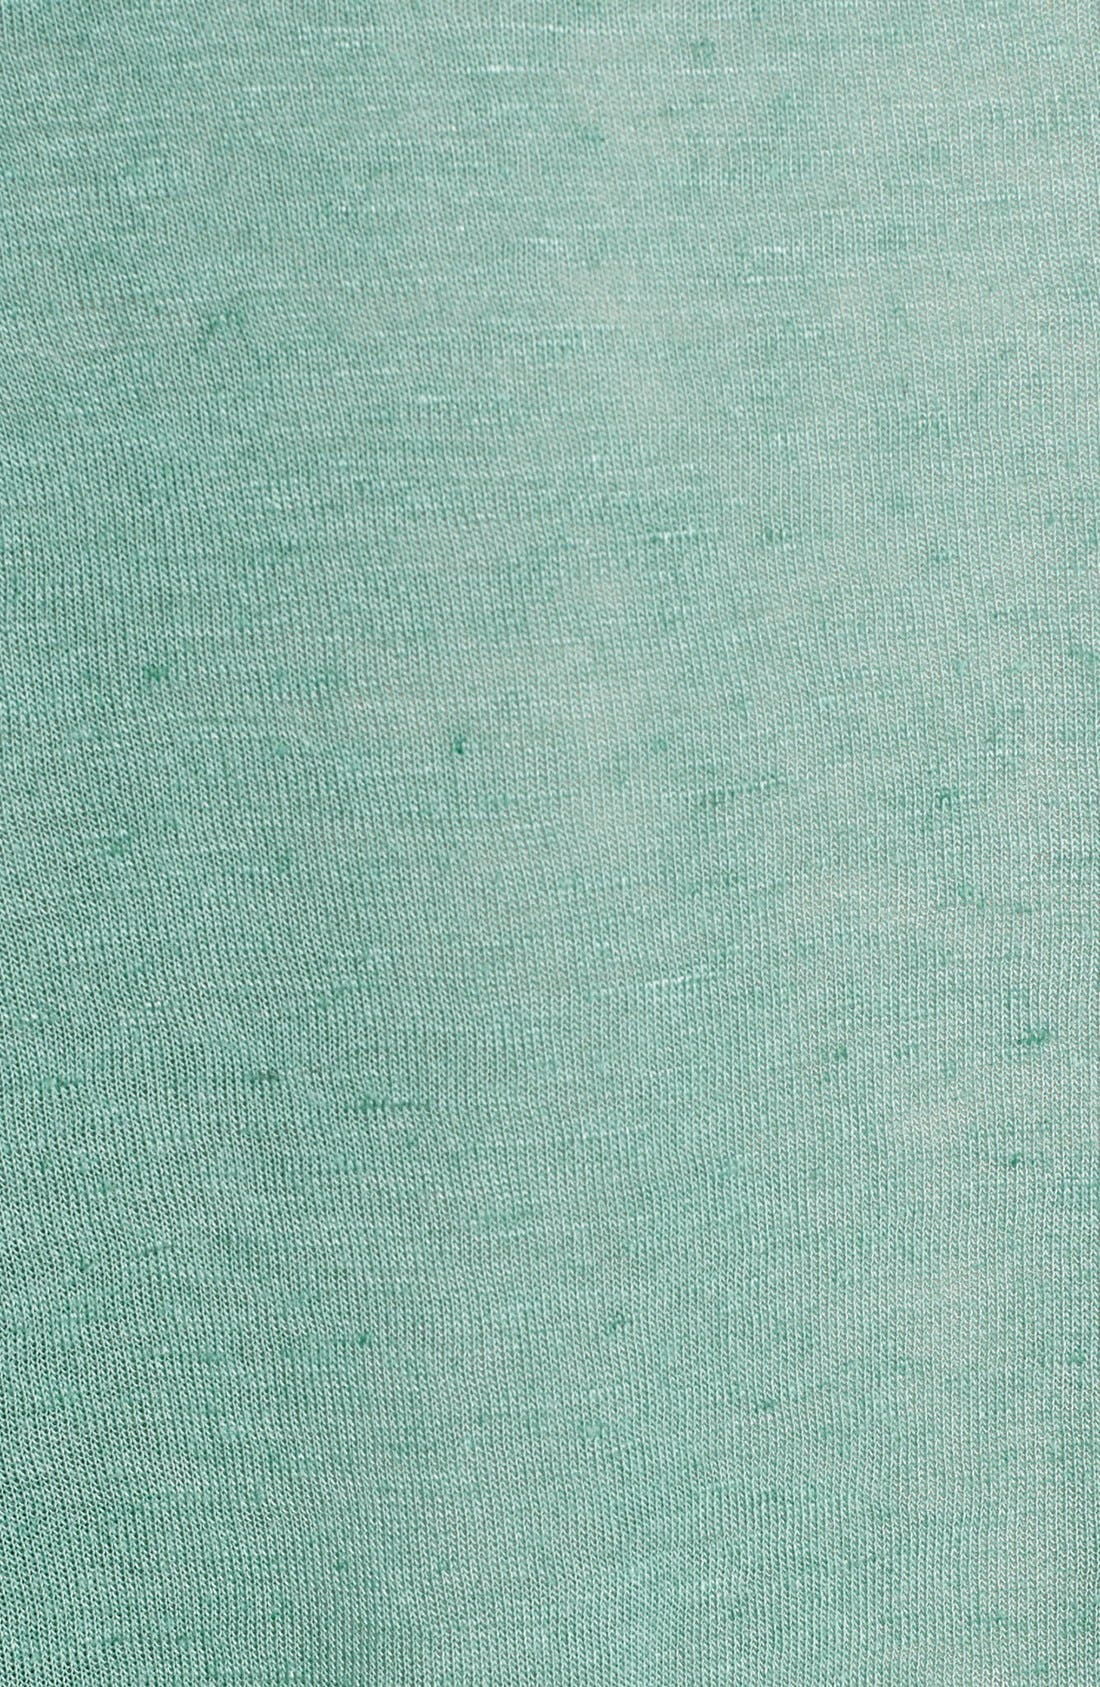 Alternate Image 3  - Lush Crochet Detail Tee (Juniors)